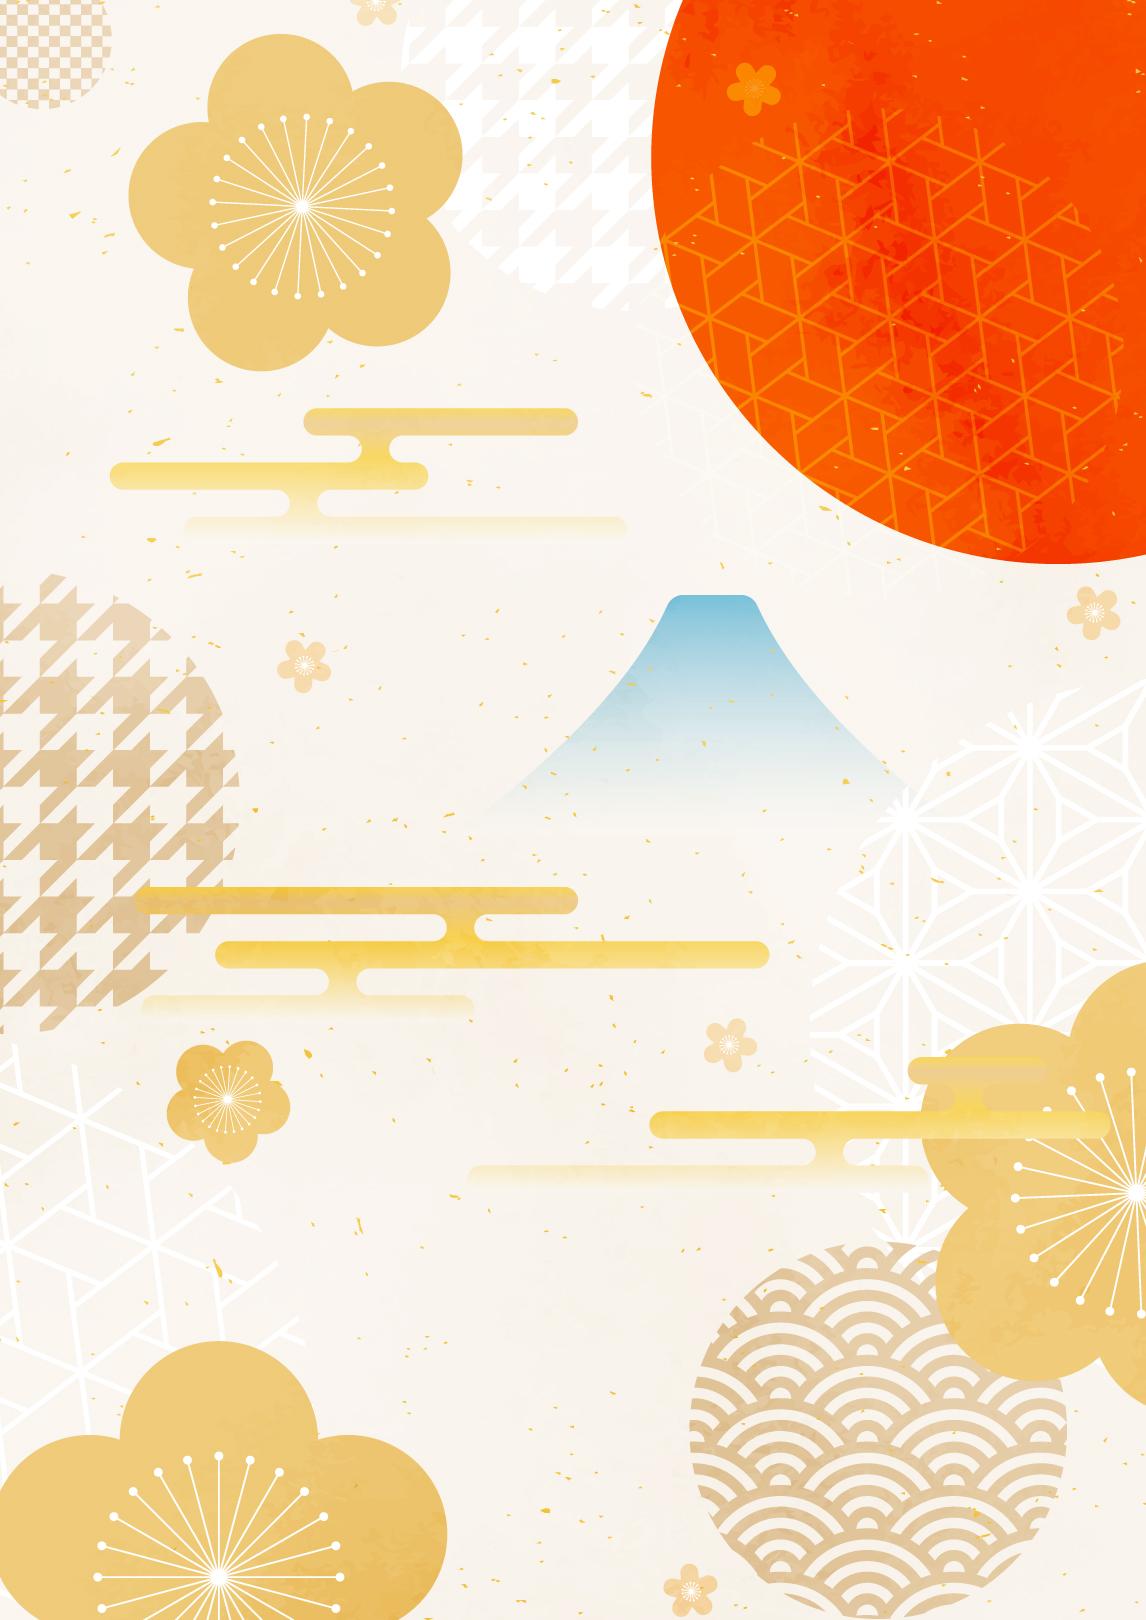 http://www.e-taishin.com/diary/img/newyear.jpg